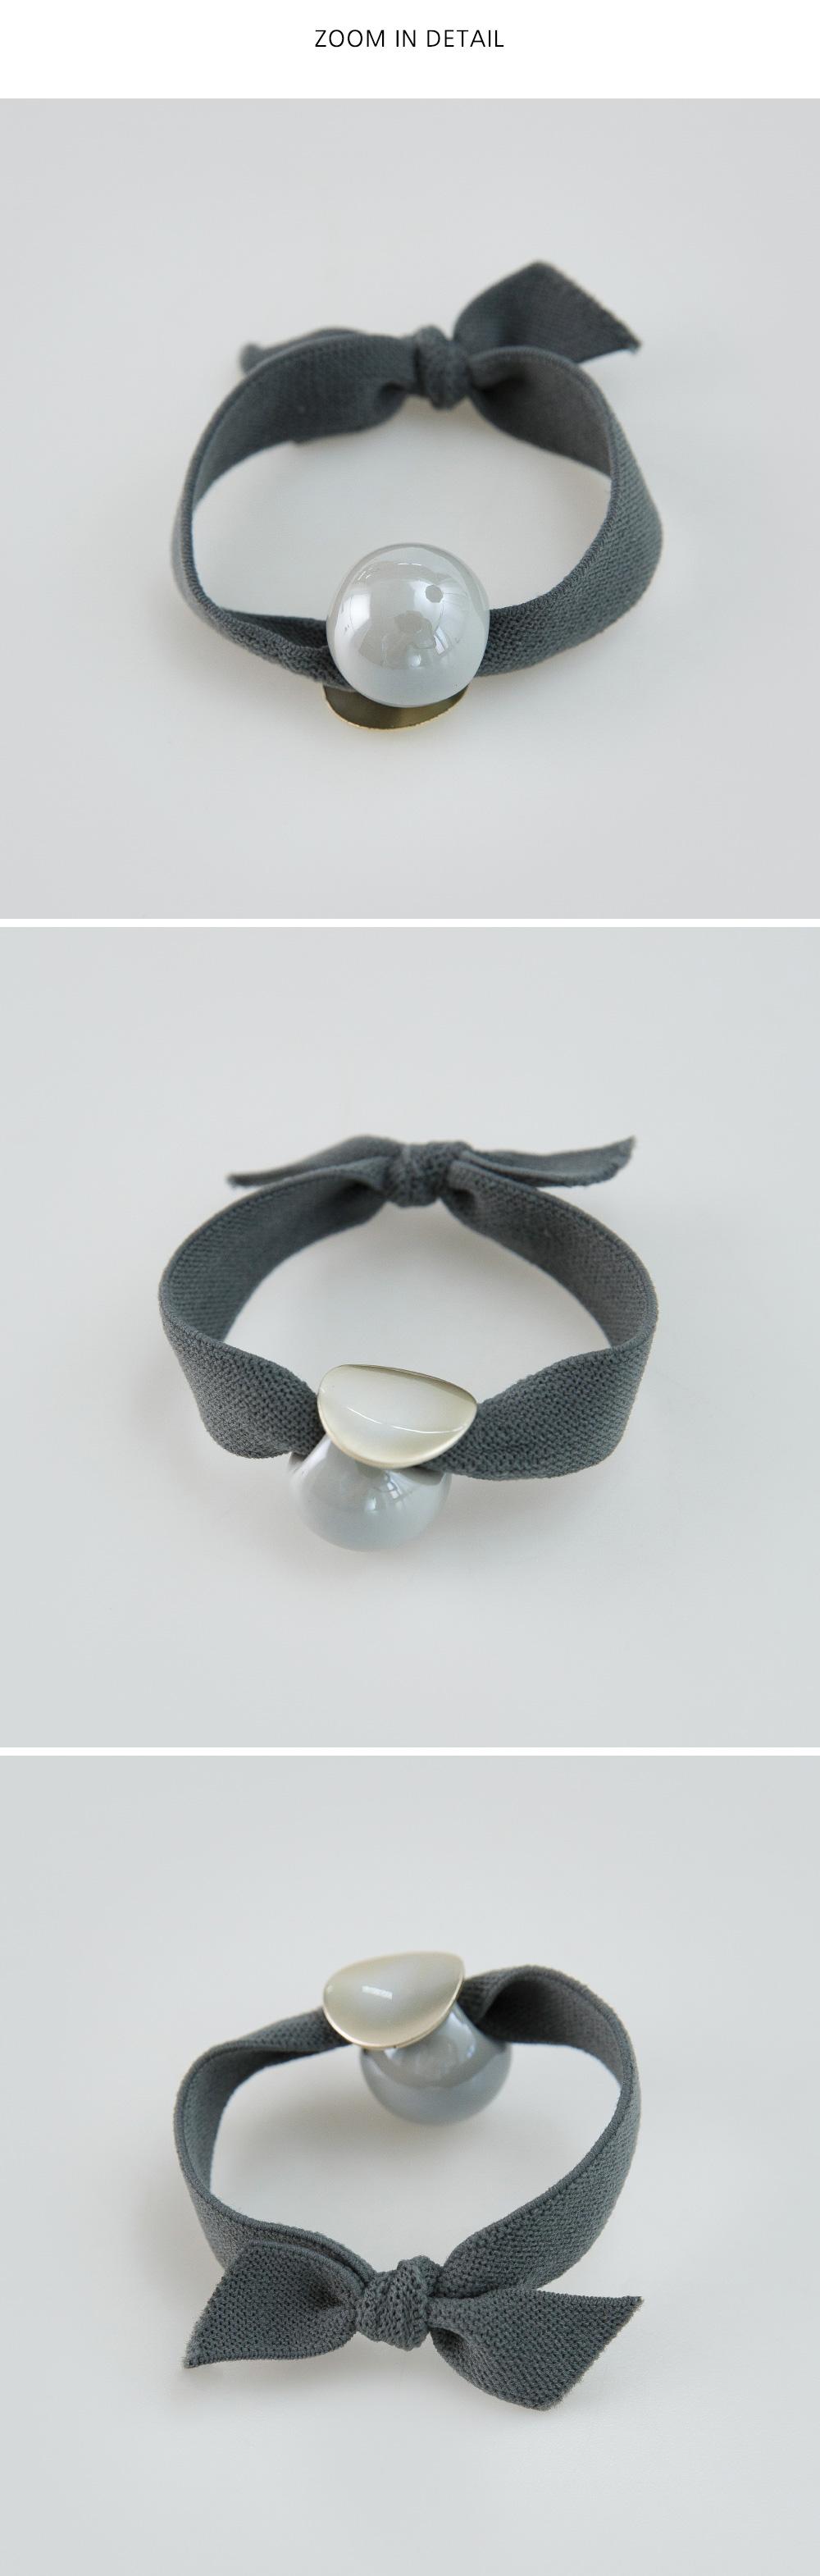 Ball pendant color hair strap